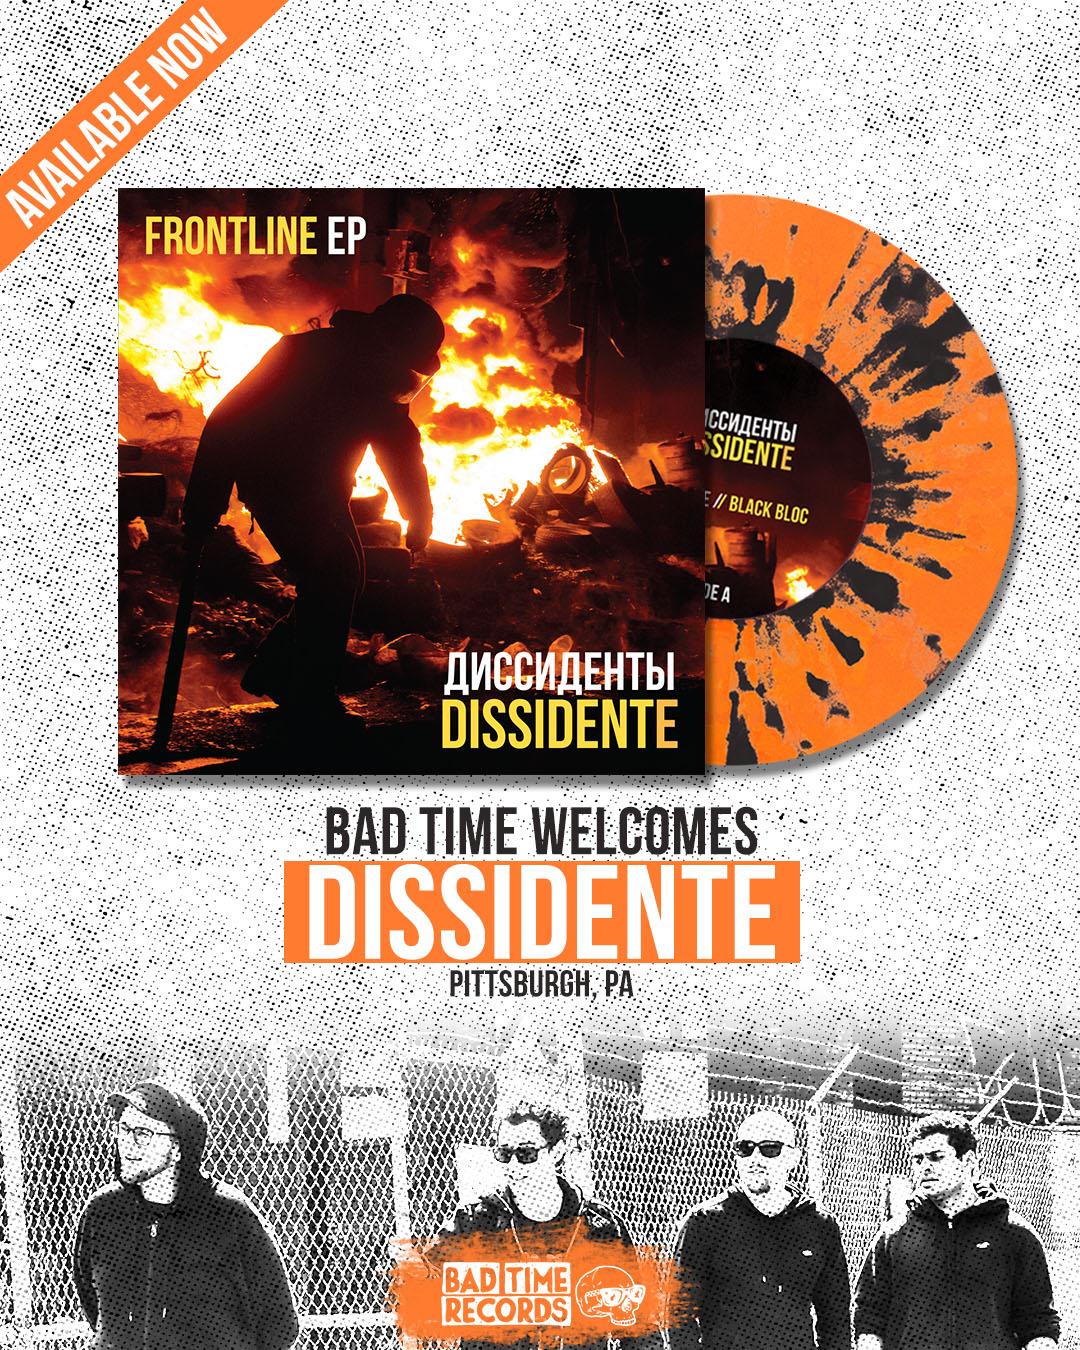 DISSIDENTE album announce.jpg